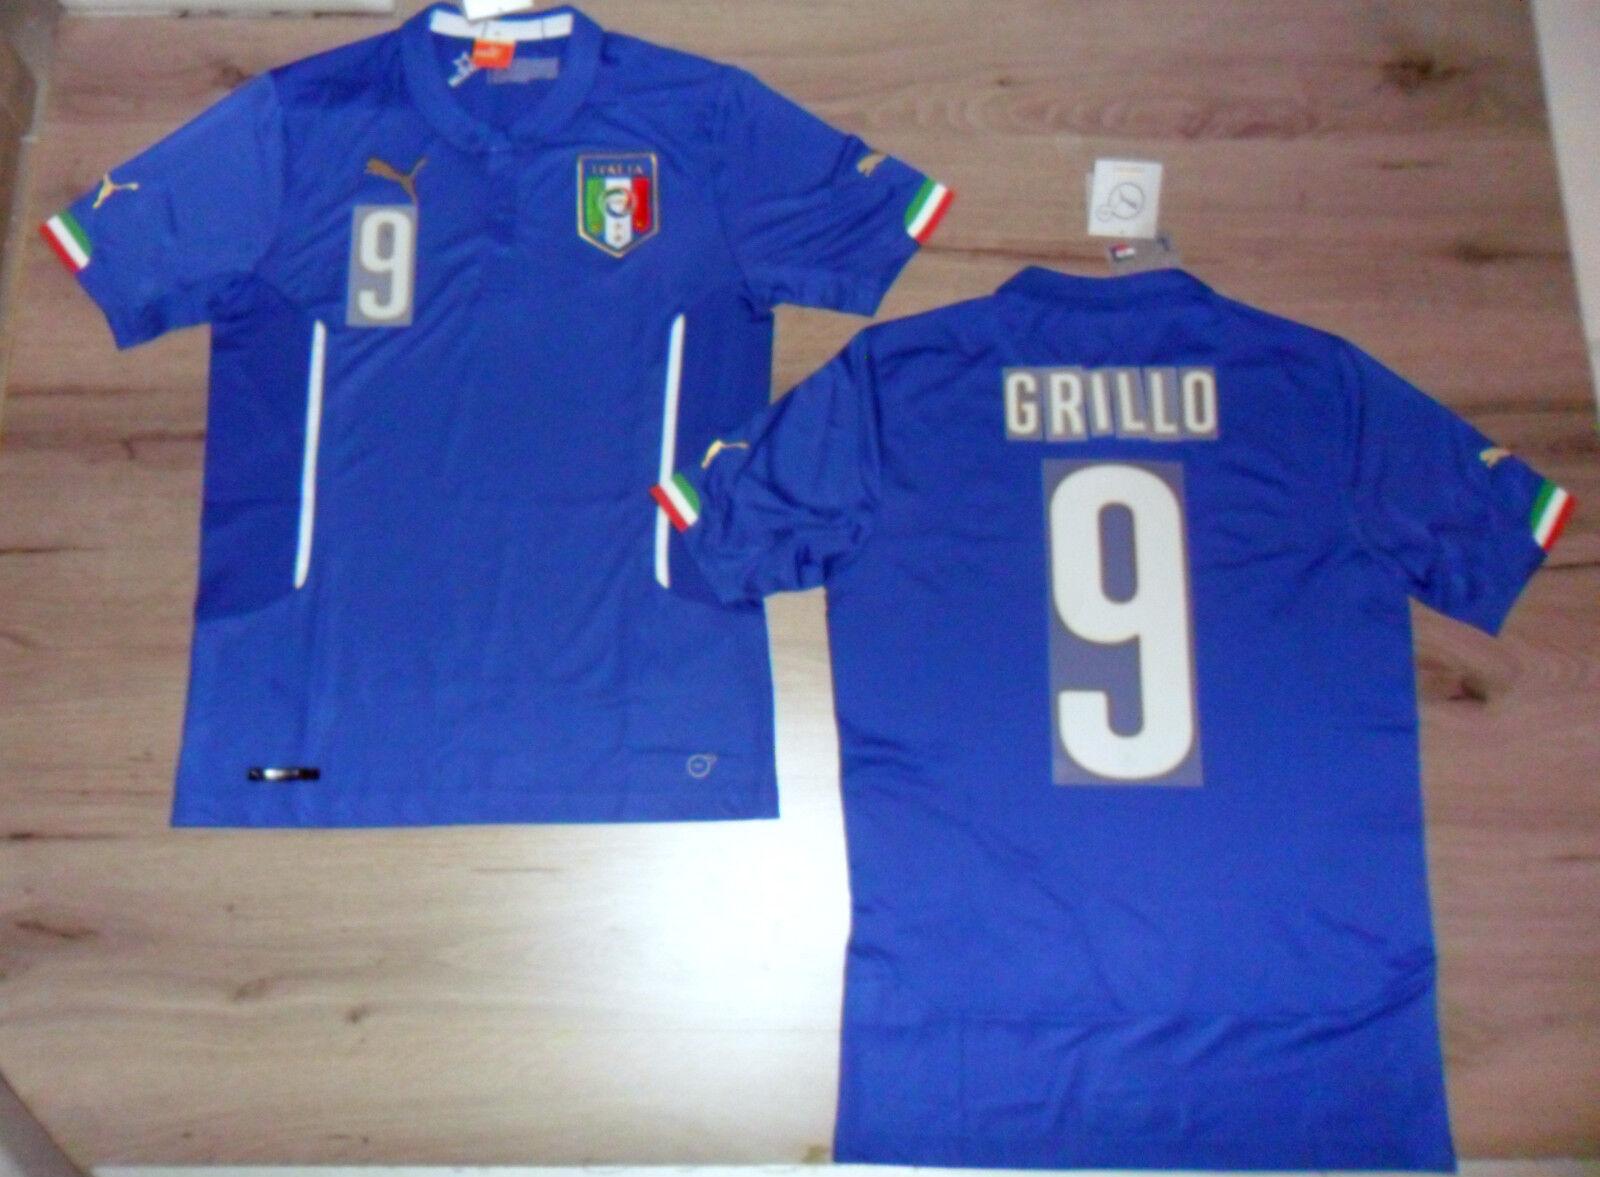 FW14 PUMA XXL XXL XXL HOME ITALIEN 9 BEPPE GRILLO SPERRFENSTER T-SHIRT WELT TRIKOT 10533c